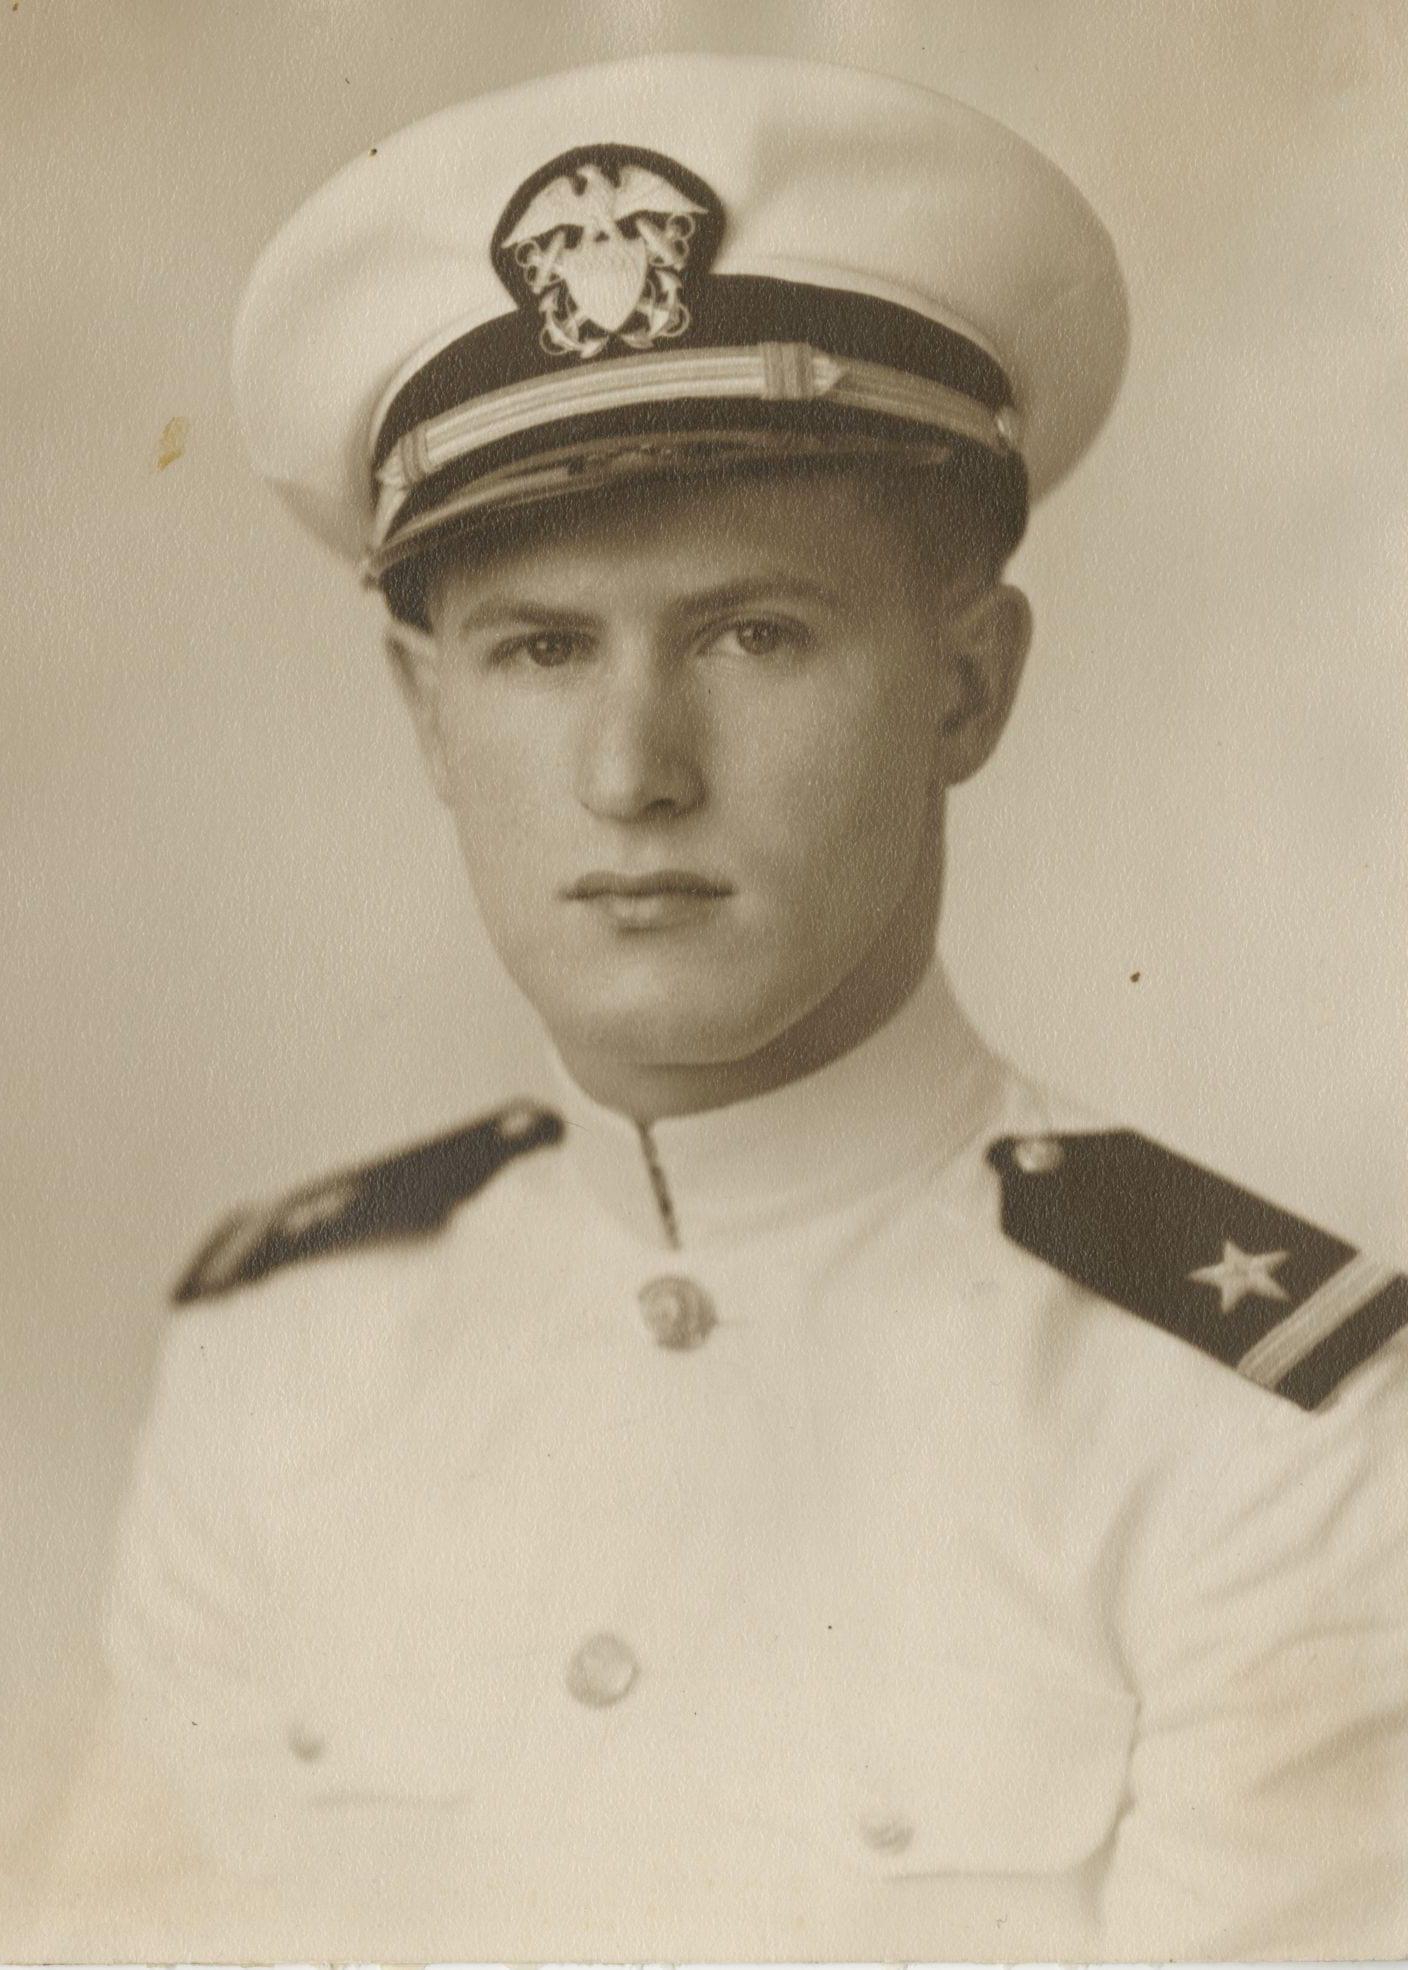 Photo of Henry Astrin in dress naval uniform